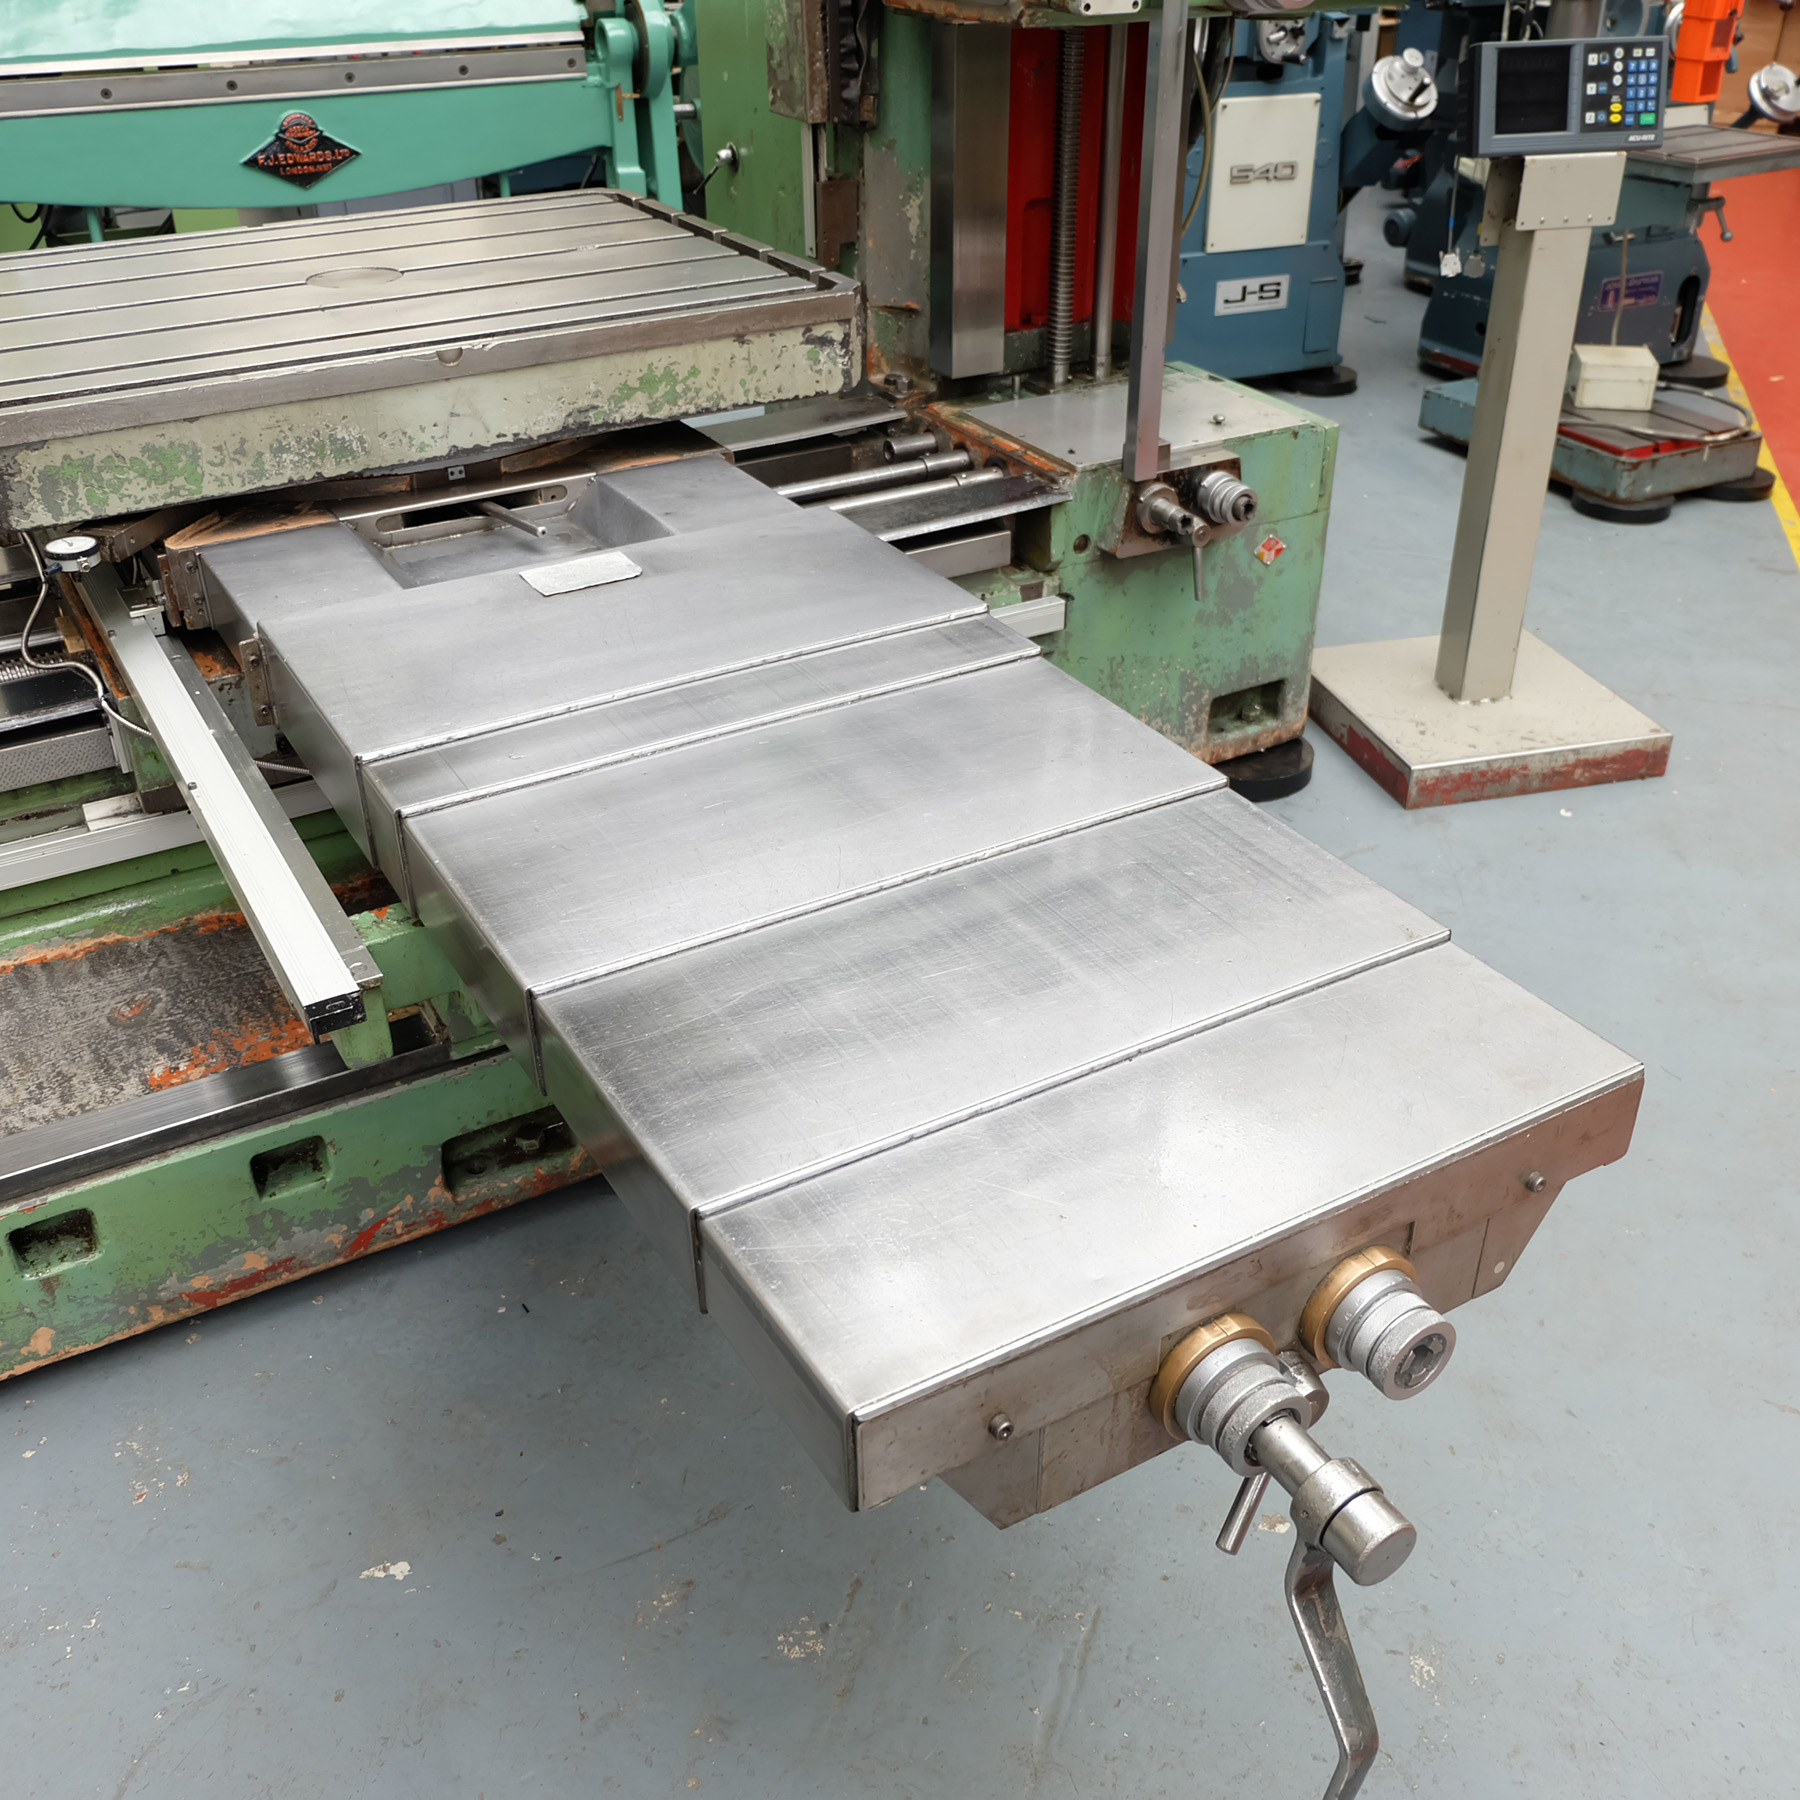 Ceruti Model ABC 75 Horizontal Boring & Milling Machine. With Tooling. - Image 4 of 15